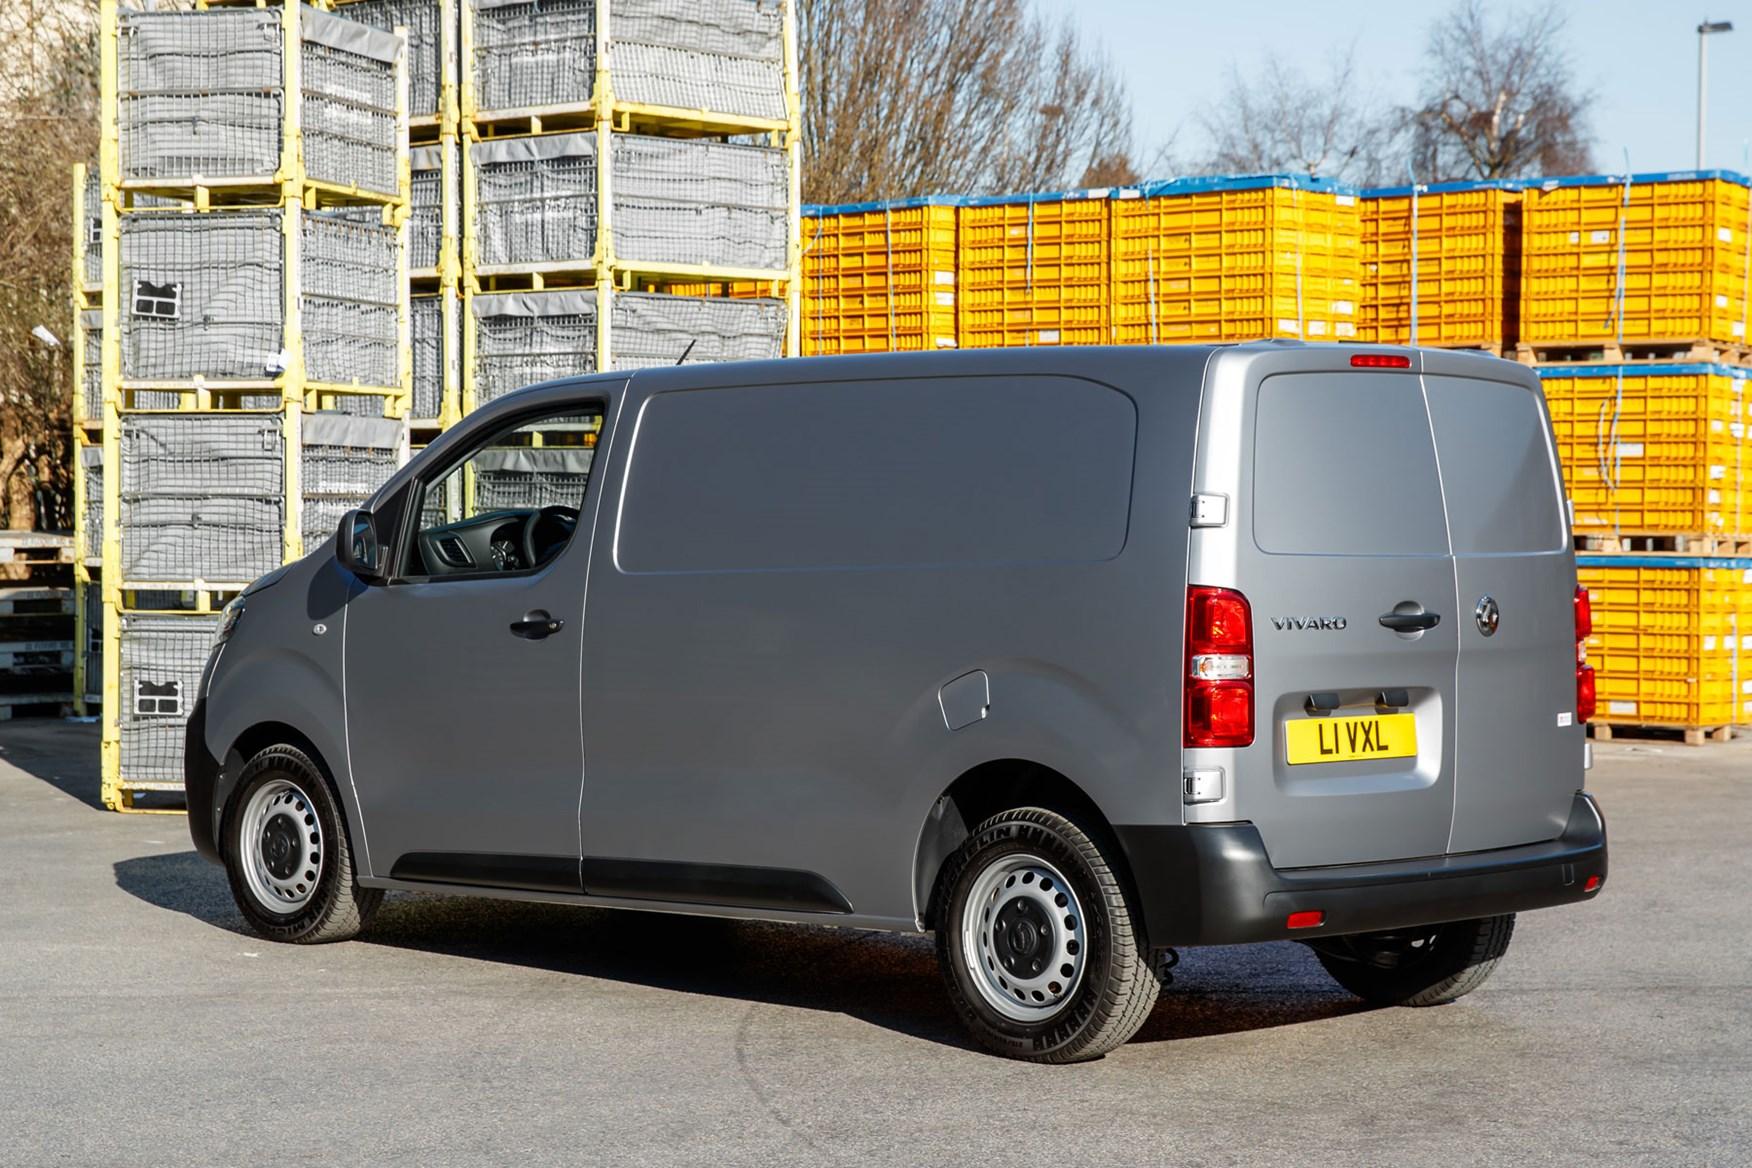 Vauxhall Vivaro review - rear view, silver, builders merchants